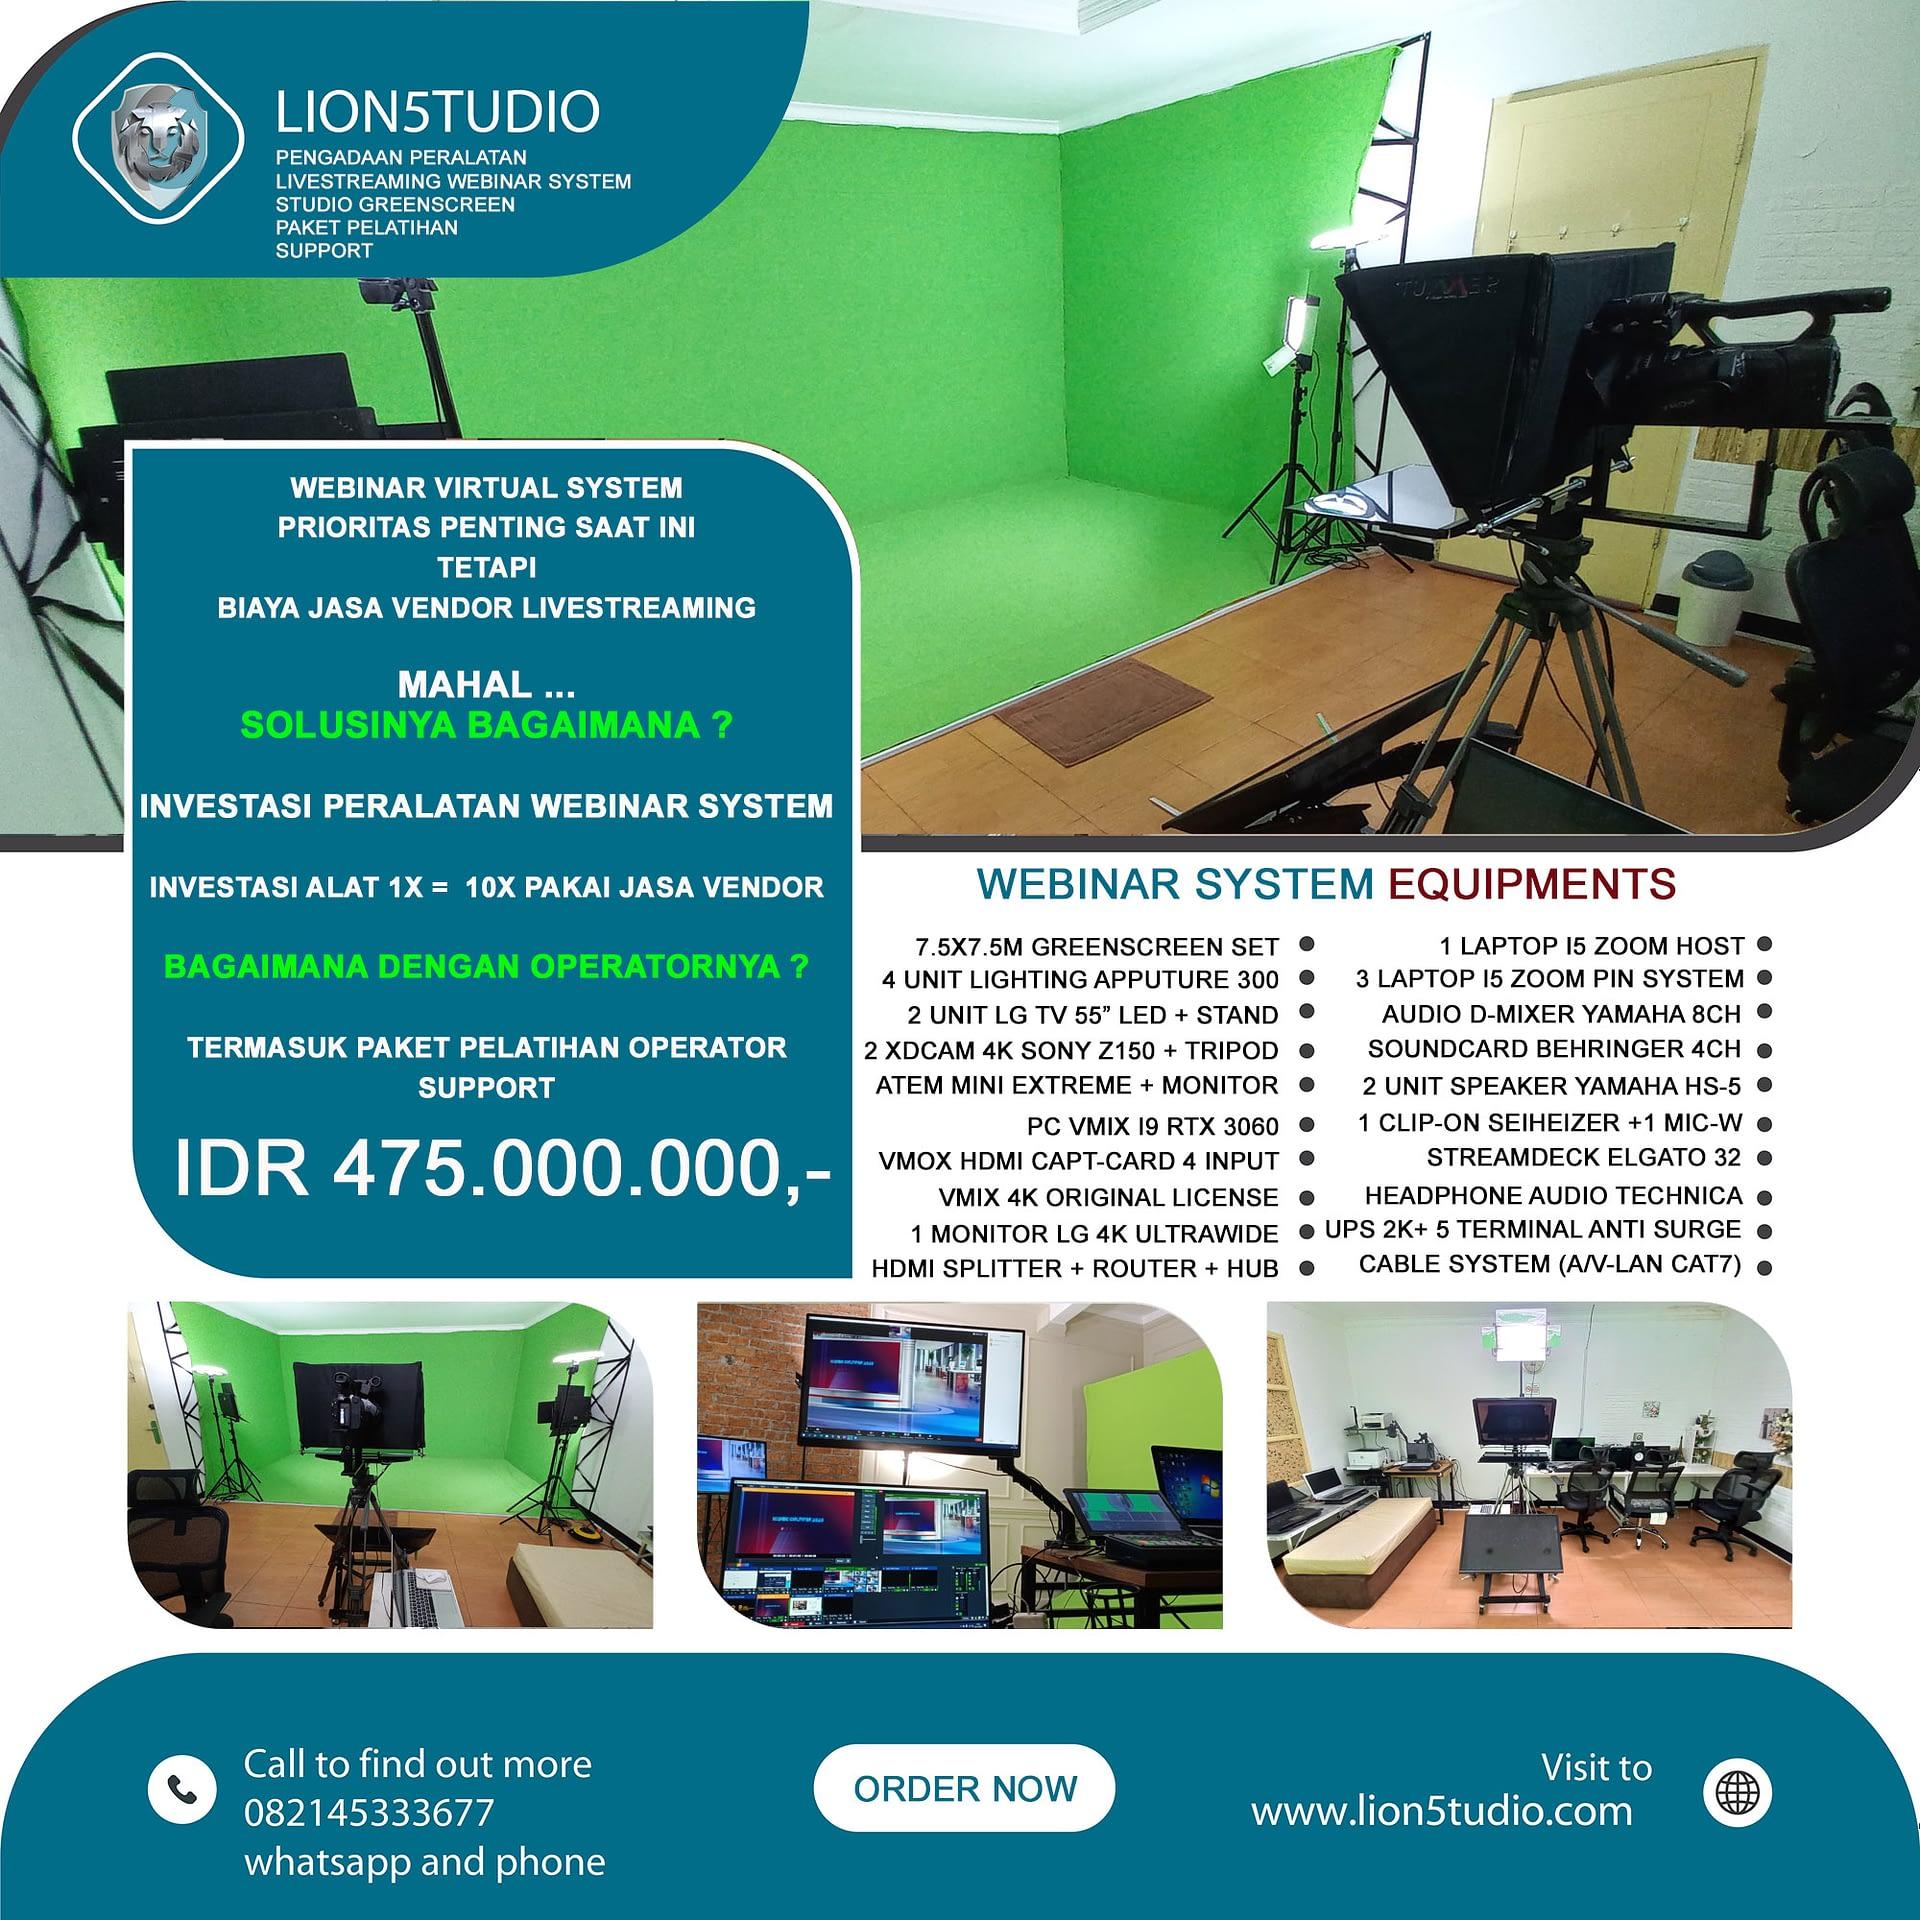 Pengadaan Peralatan Webinar Livestreaming System + Studio Greenscreen 2